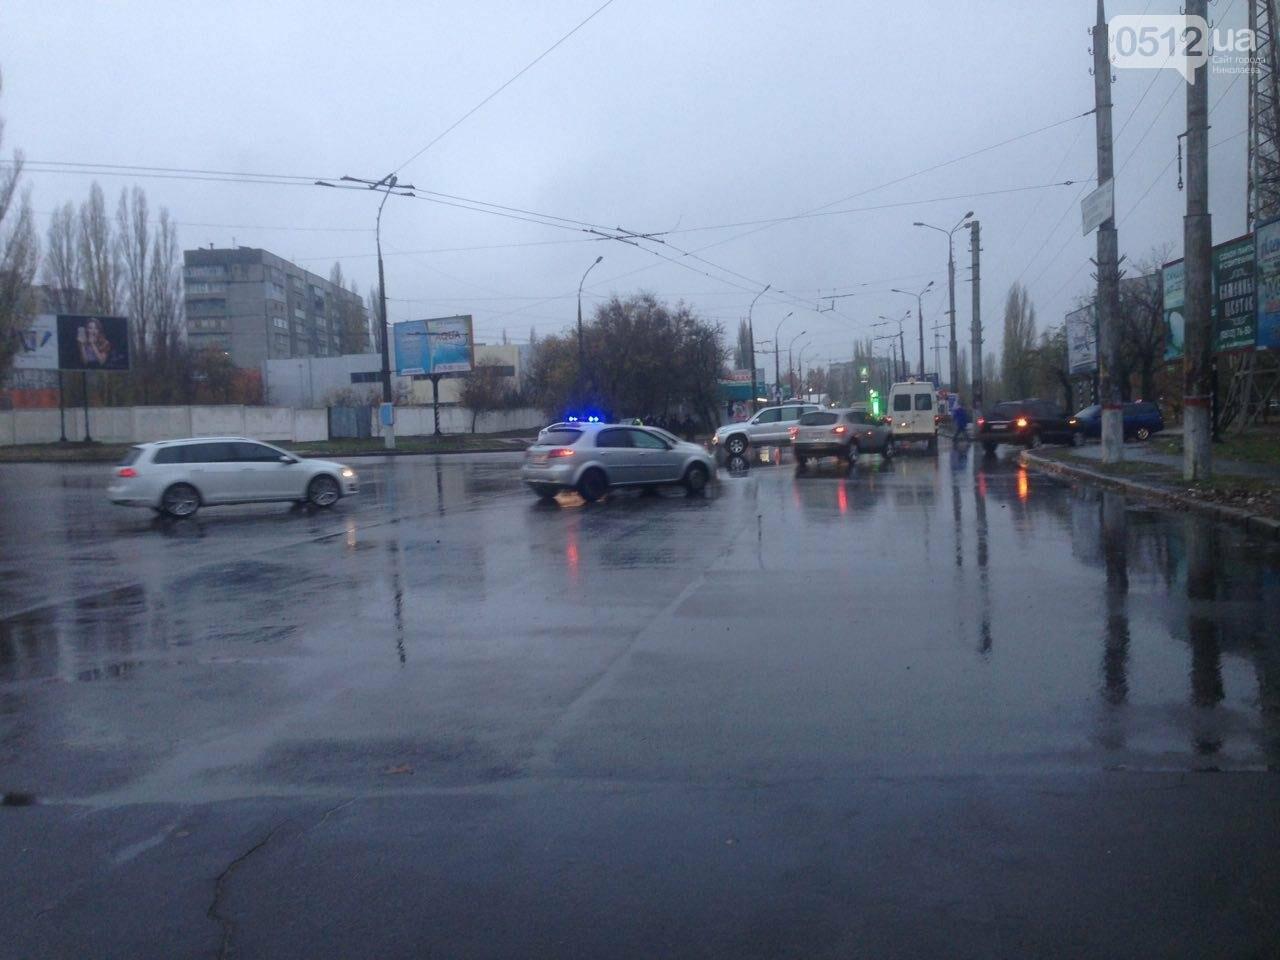 Возле спортшколы Надежда в Николаеве столкнулись Toyota и Subaru, - ФОТО , фото-9